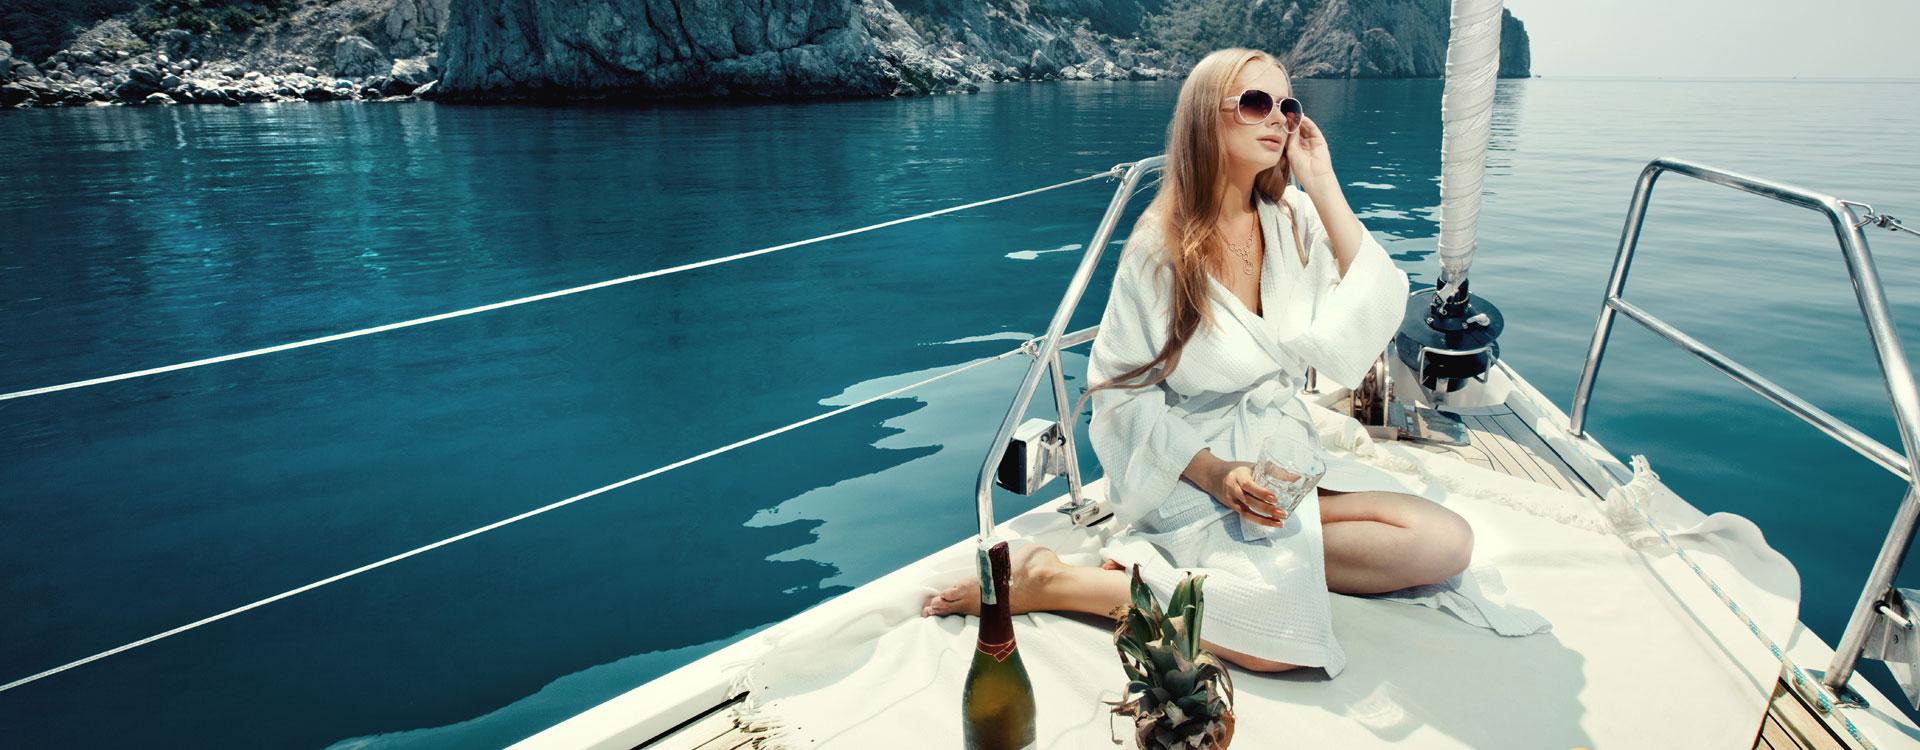 luxusurlaub-meer